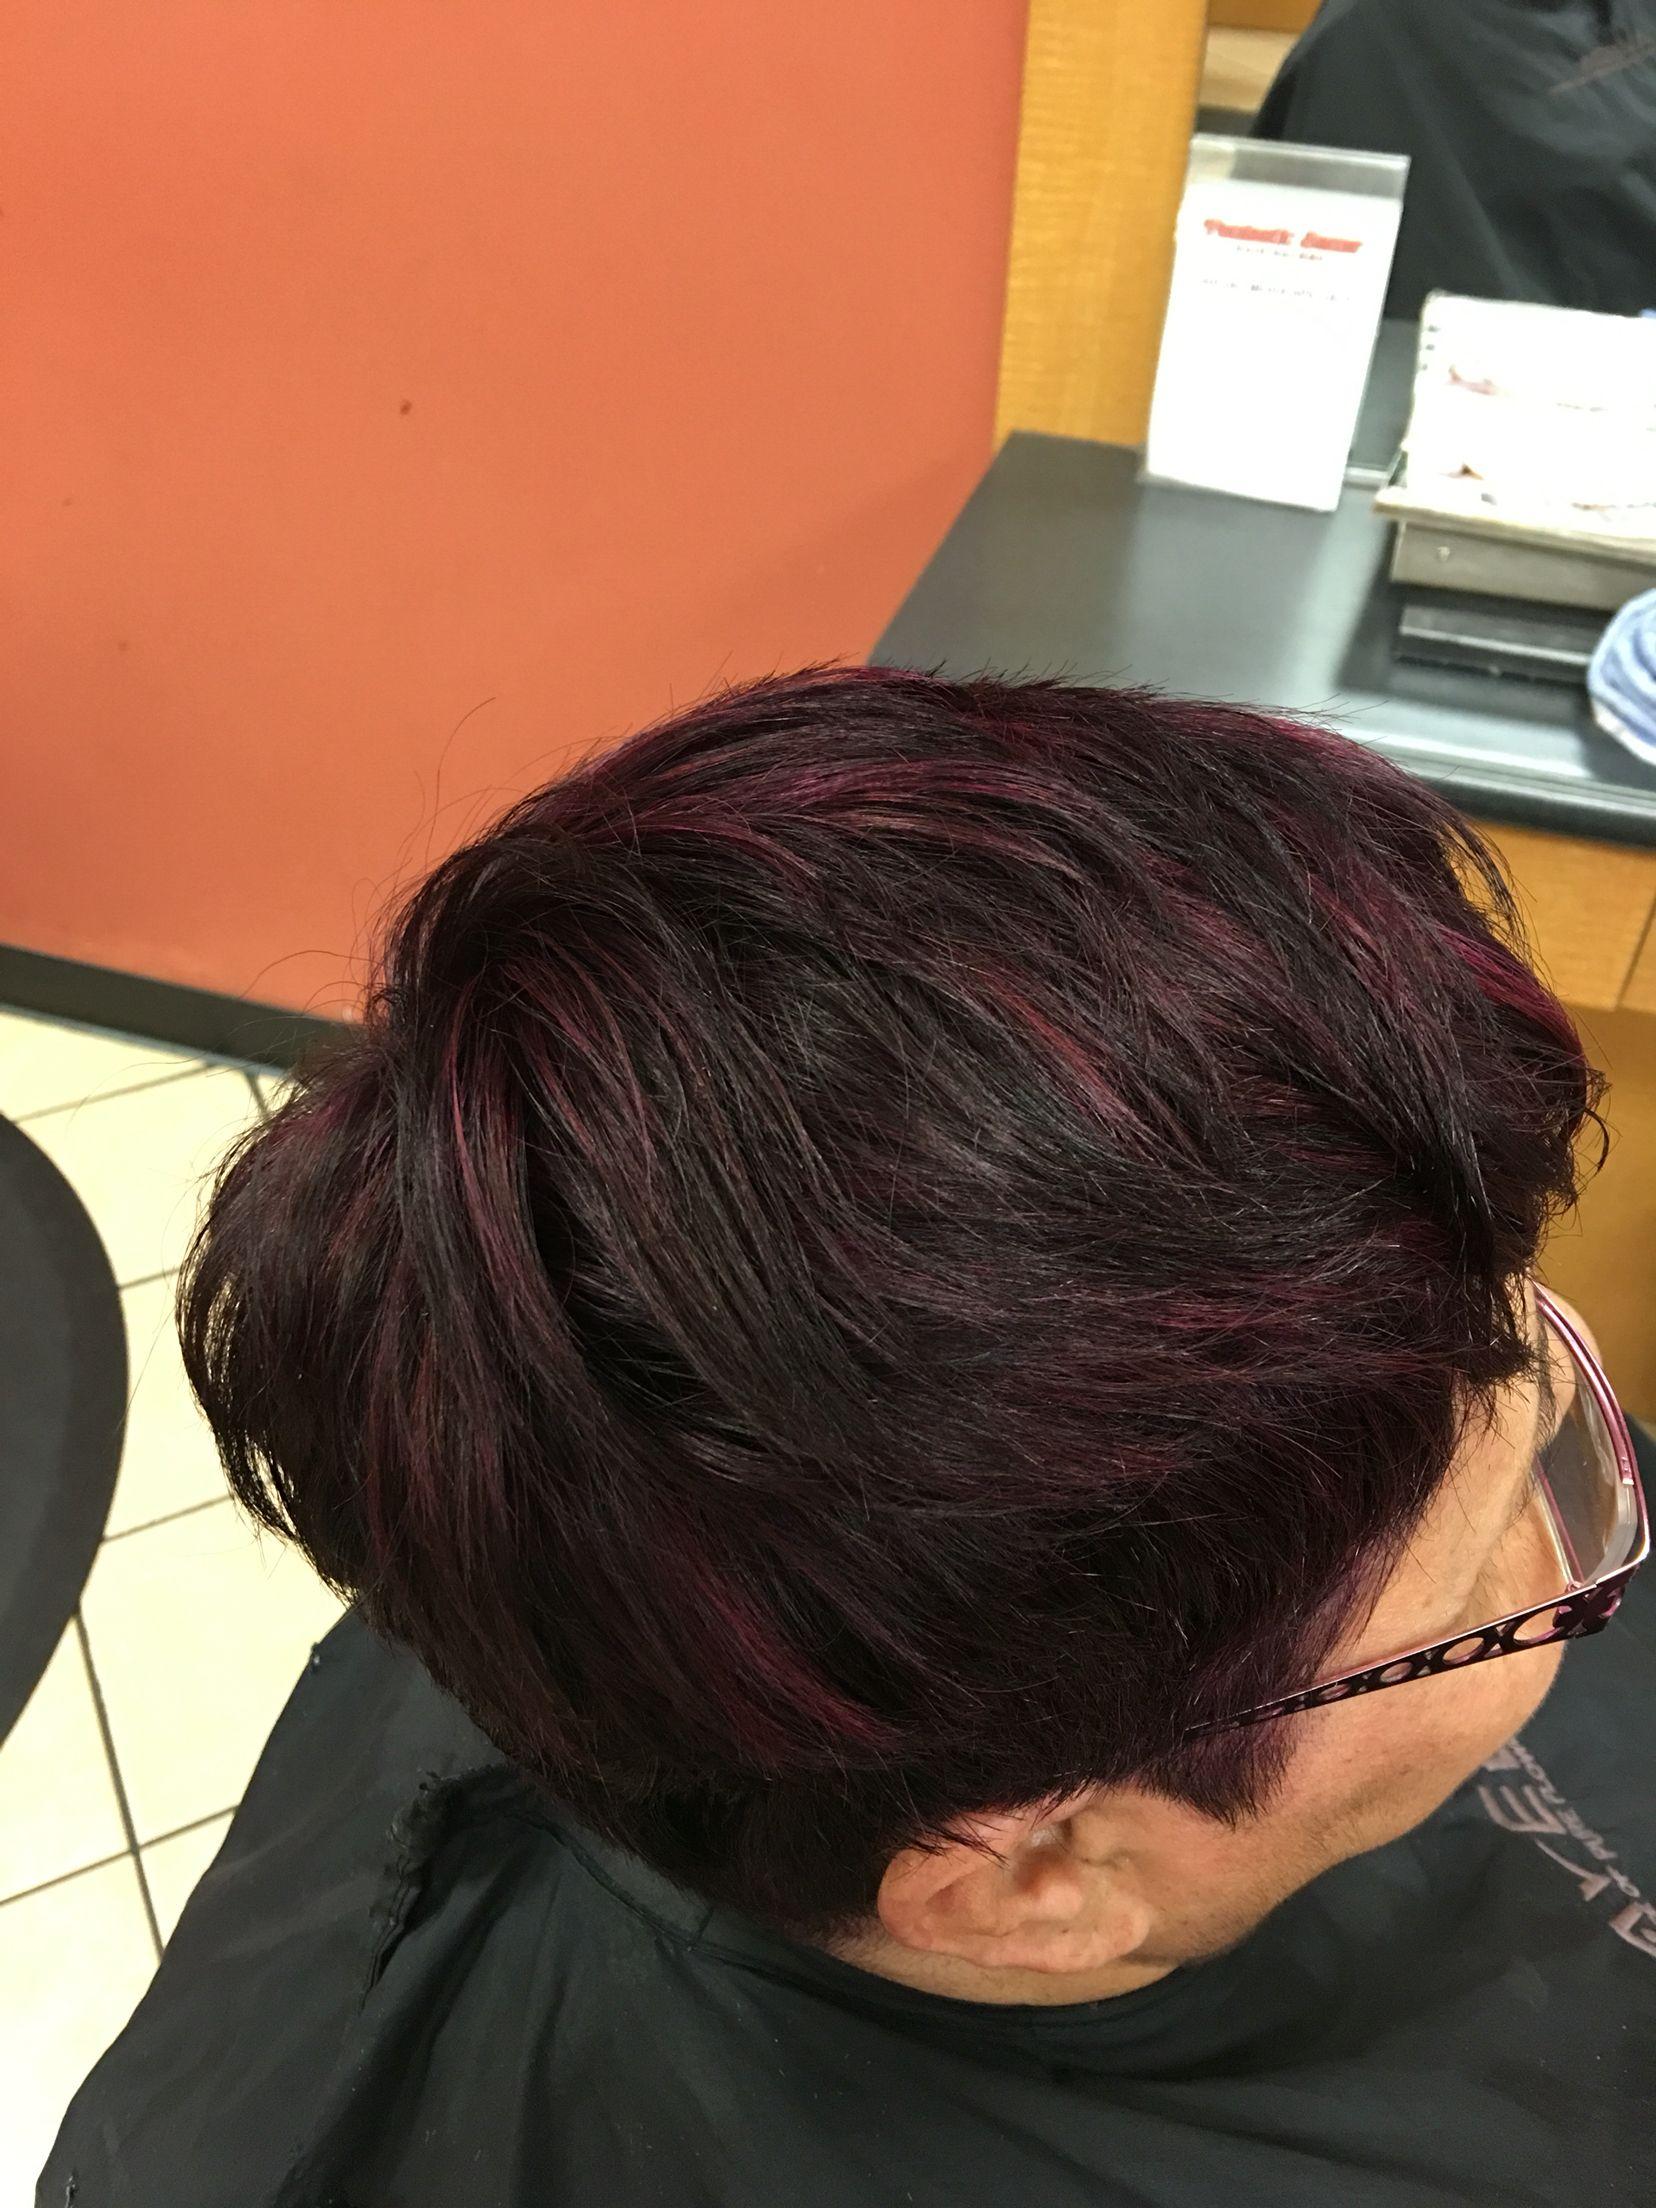 Tigi copyright colour 5522 42 3322 2 base true light and hair coloring tigi copyright colour nvjuhfo Choice Image